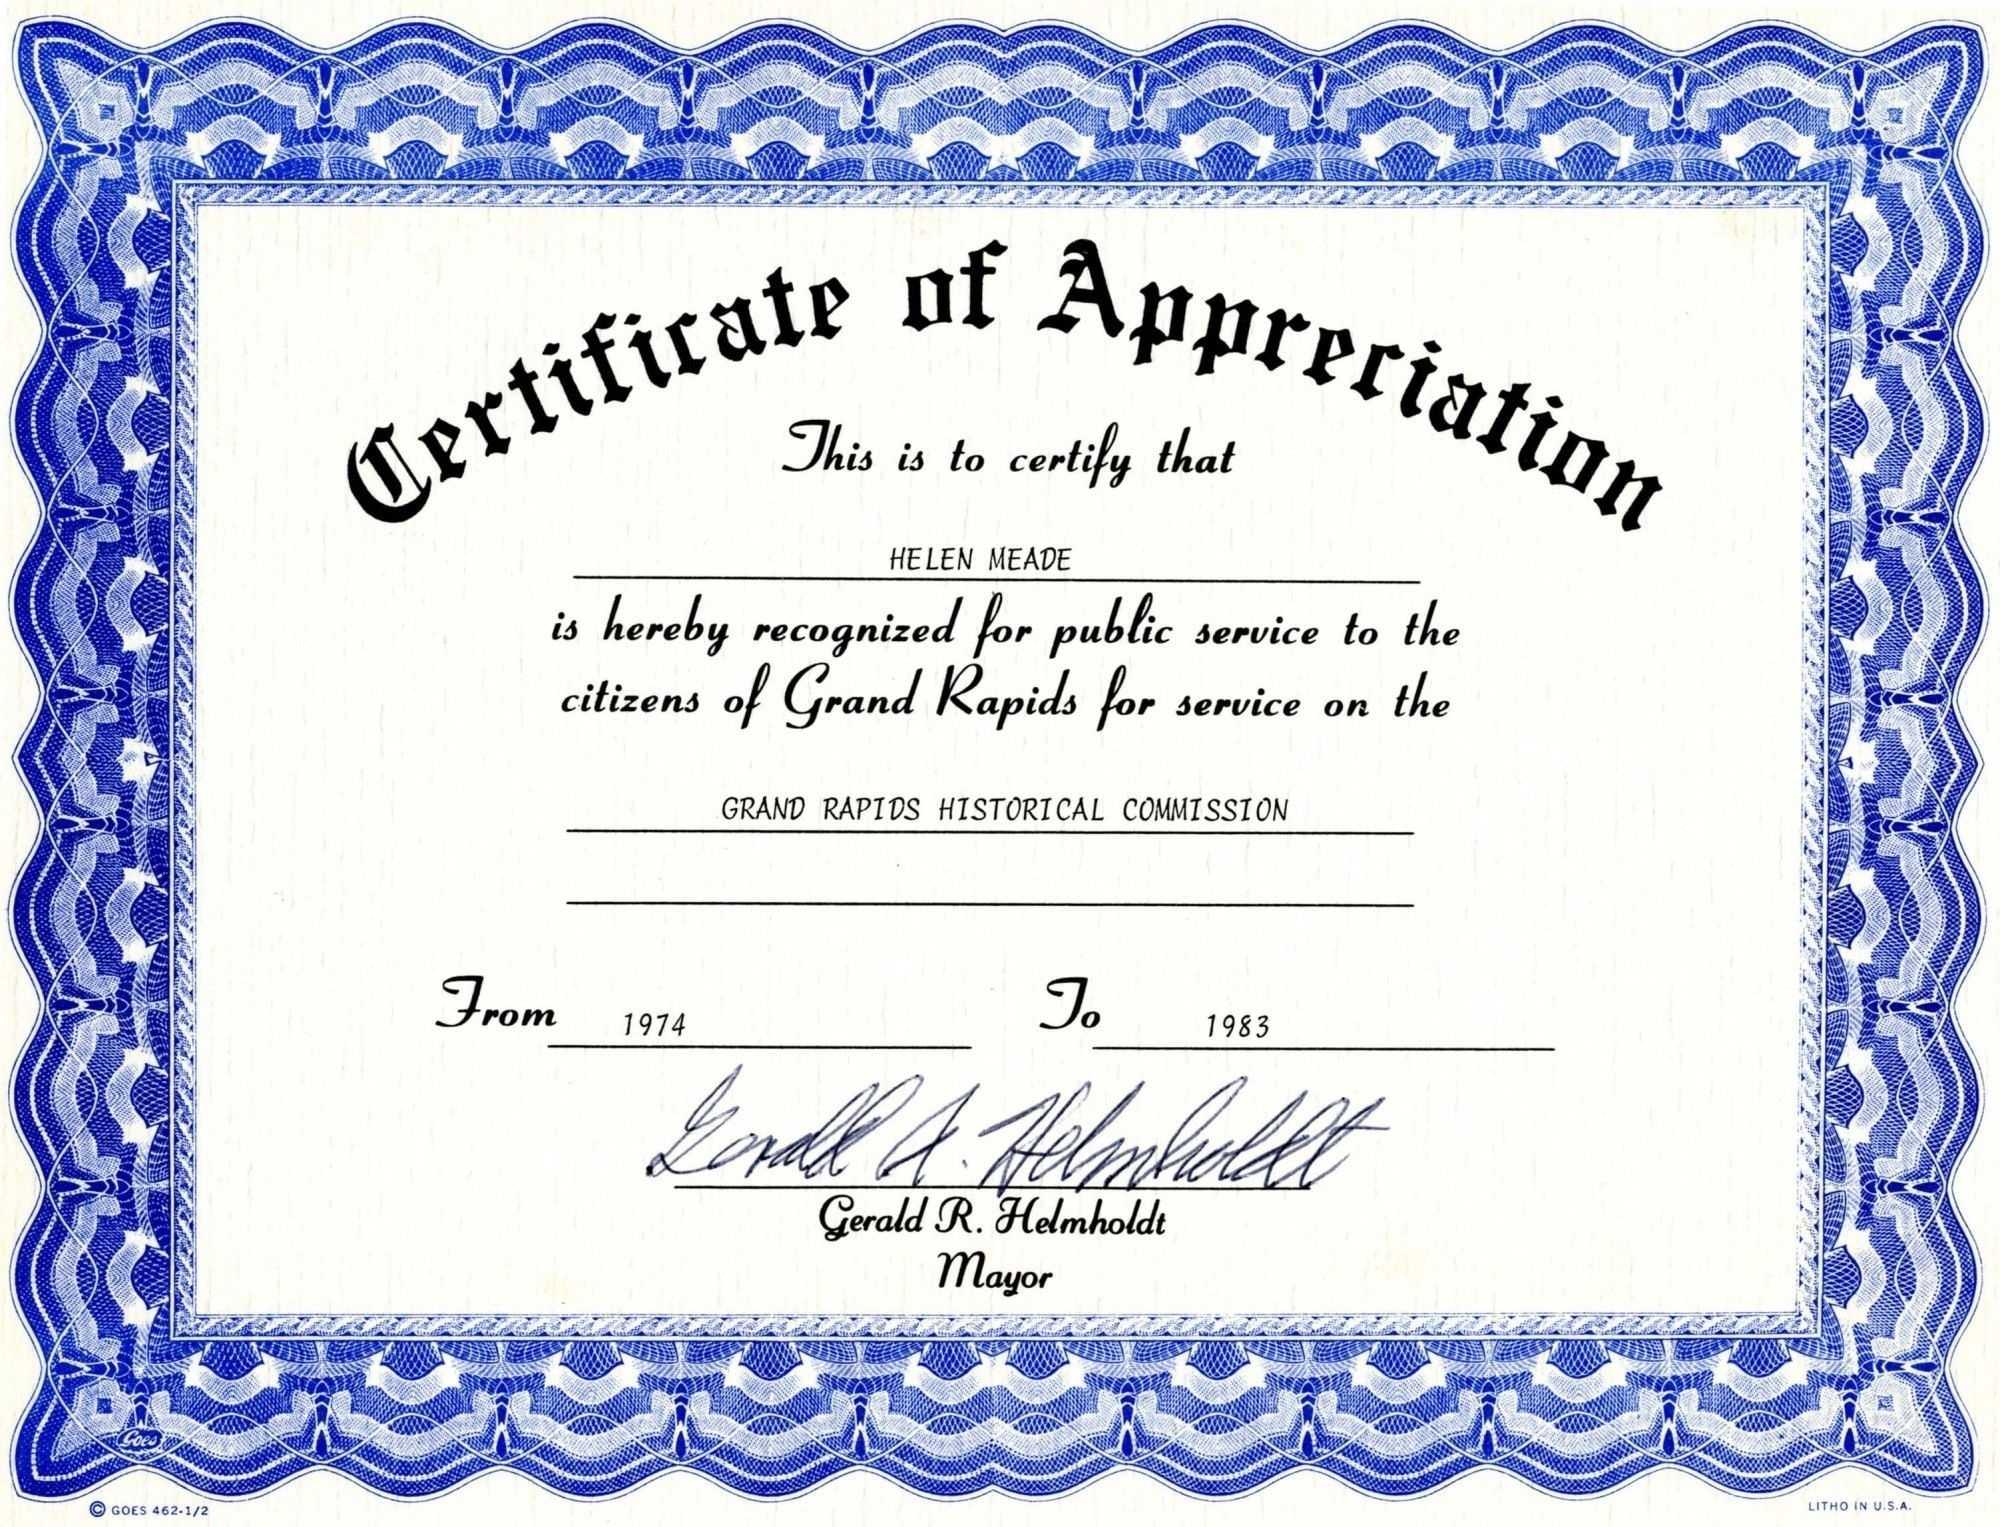 Certificate Template In Word   Safebest.xyz Intended For Template For Certificate Of Appreciation In Microsoft Word